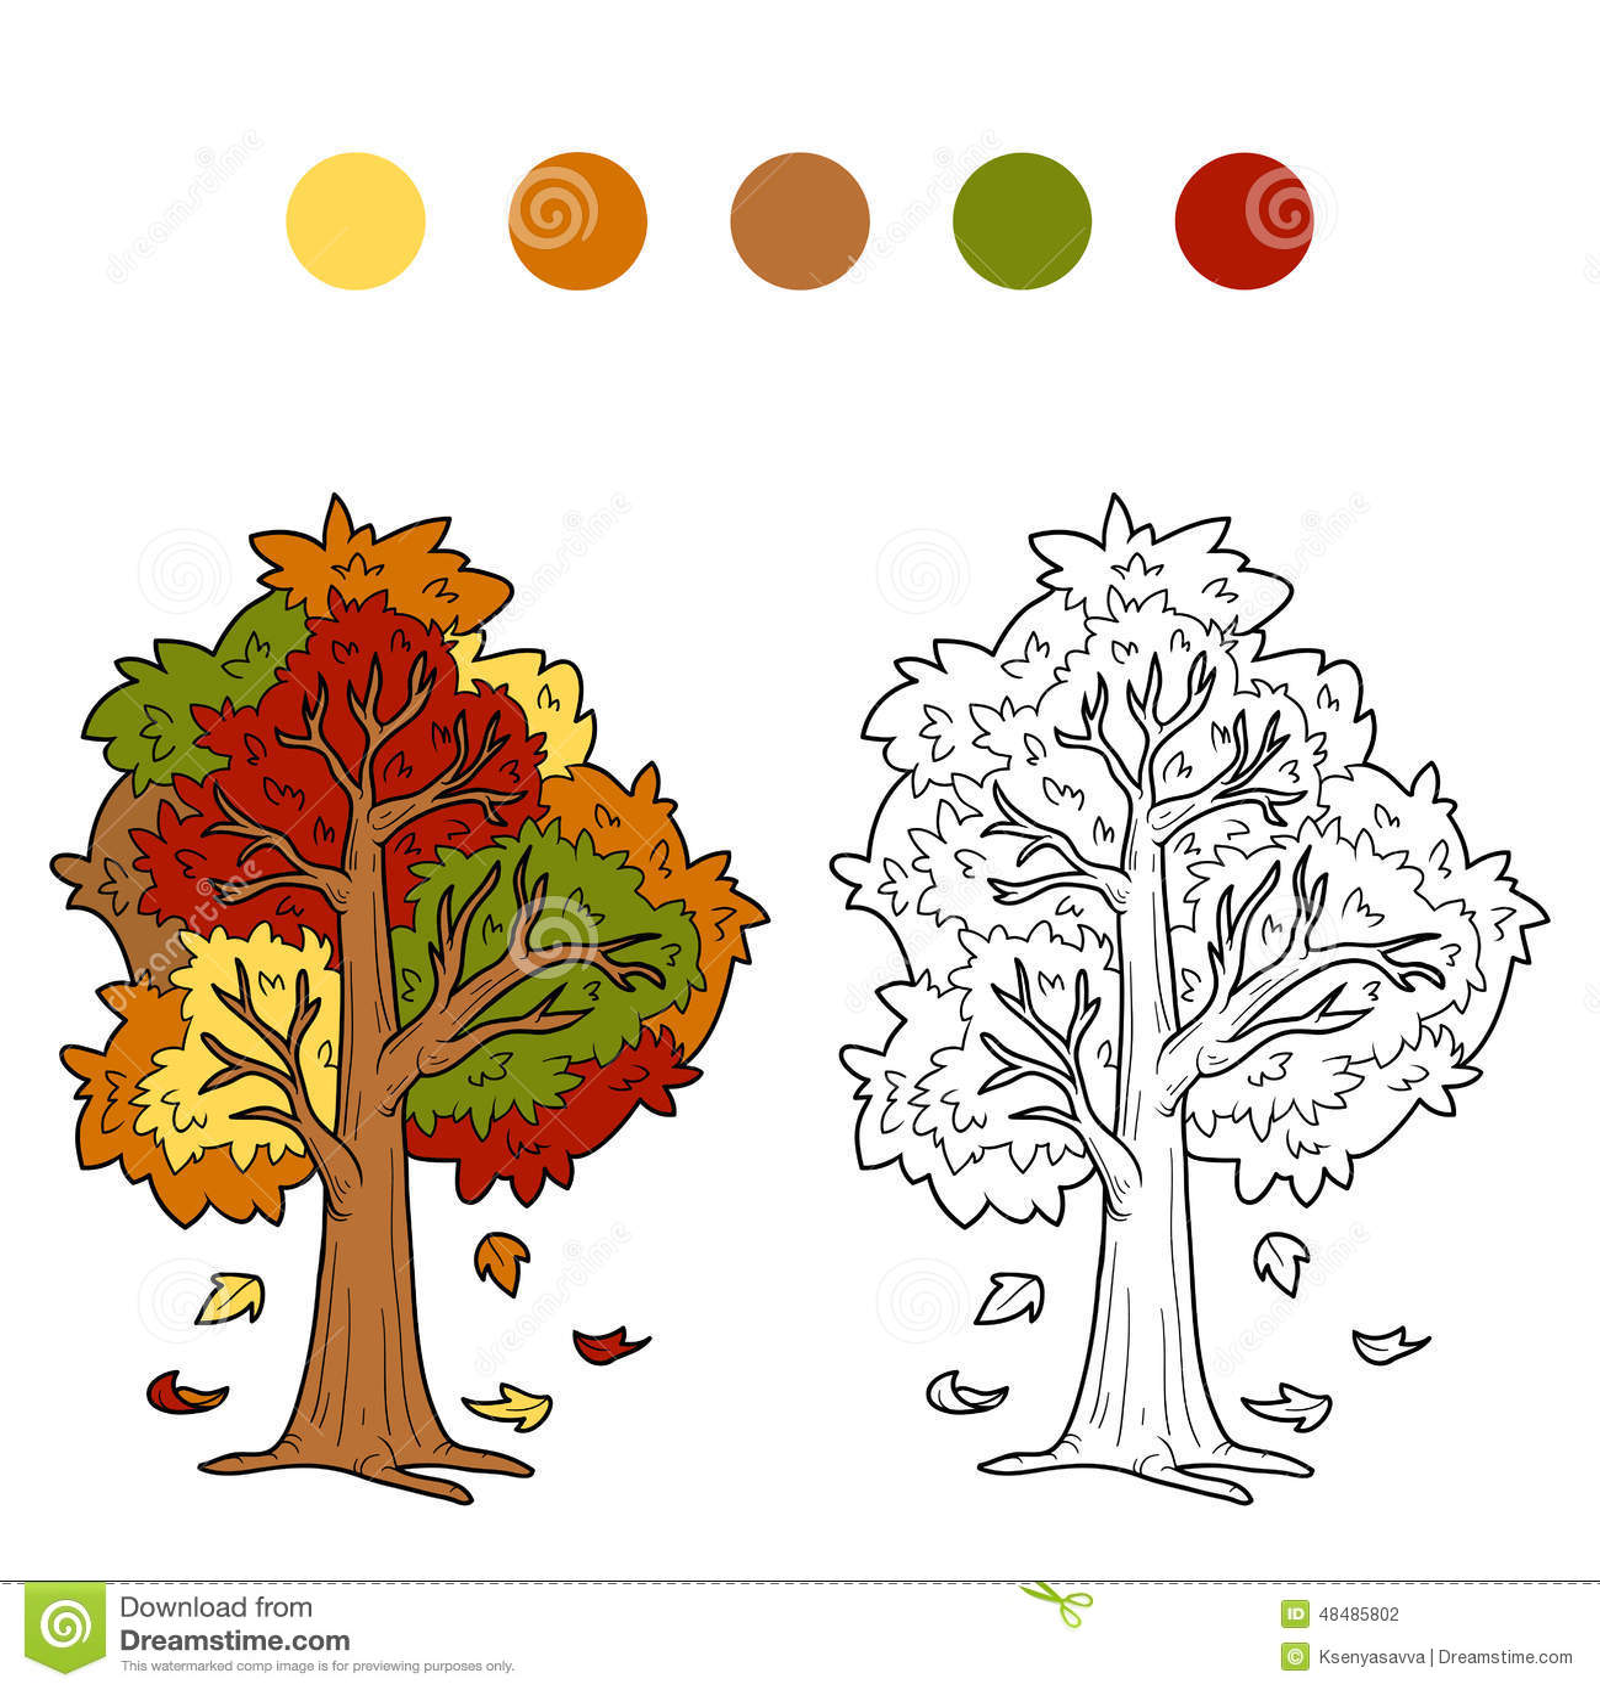 autumn book children coloring - Coloring Book For Children